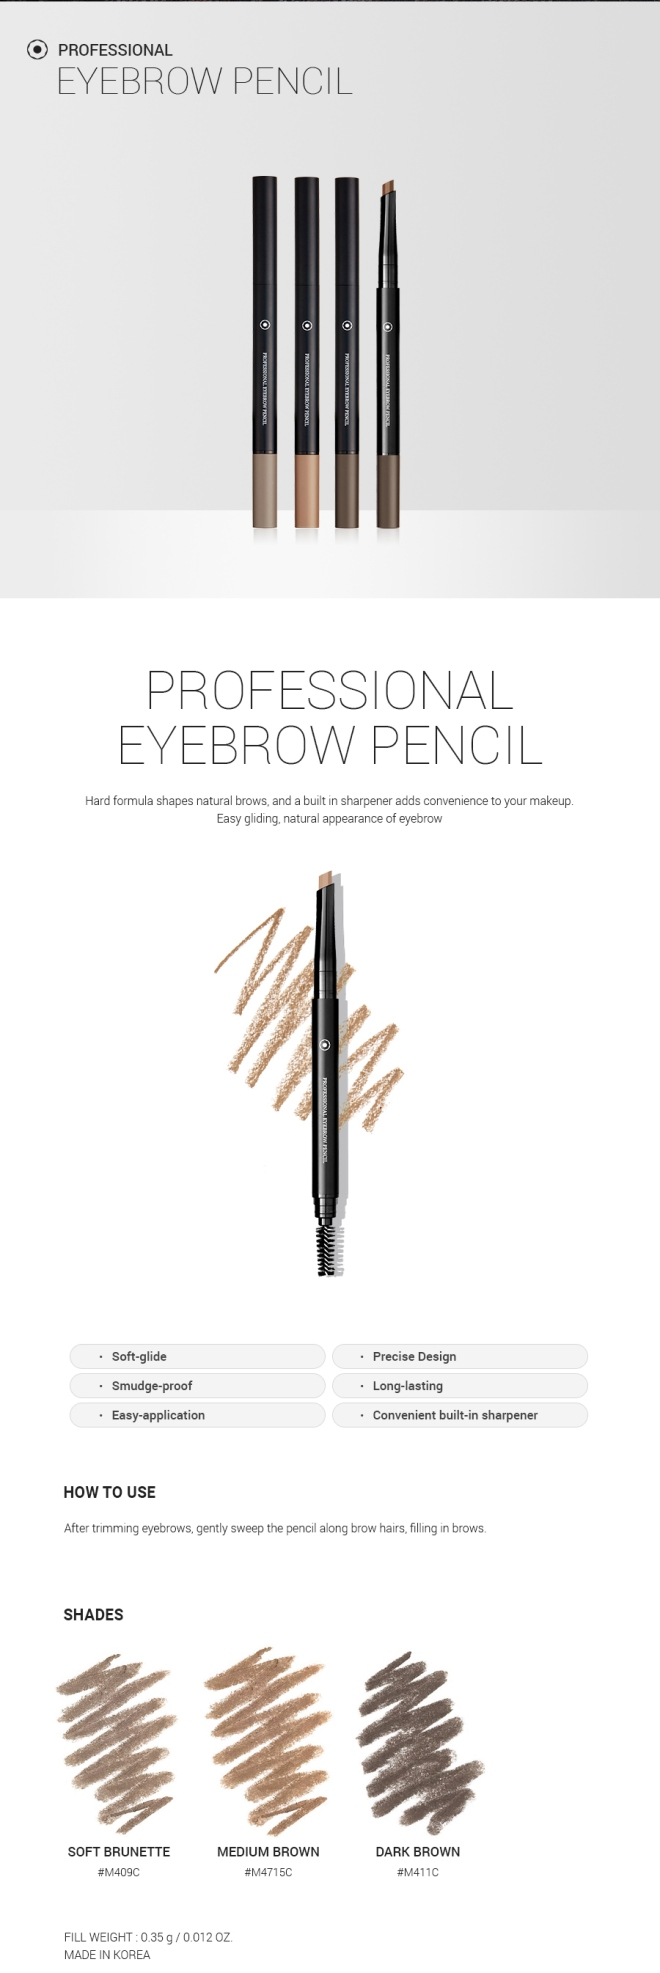 Professional Eyebrow Pencil (M411C Dark Brown) - 02